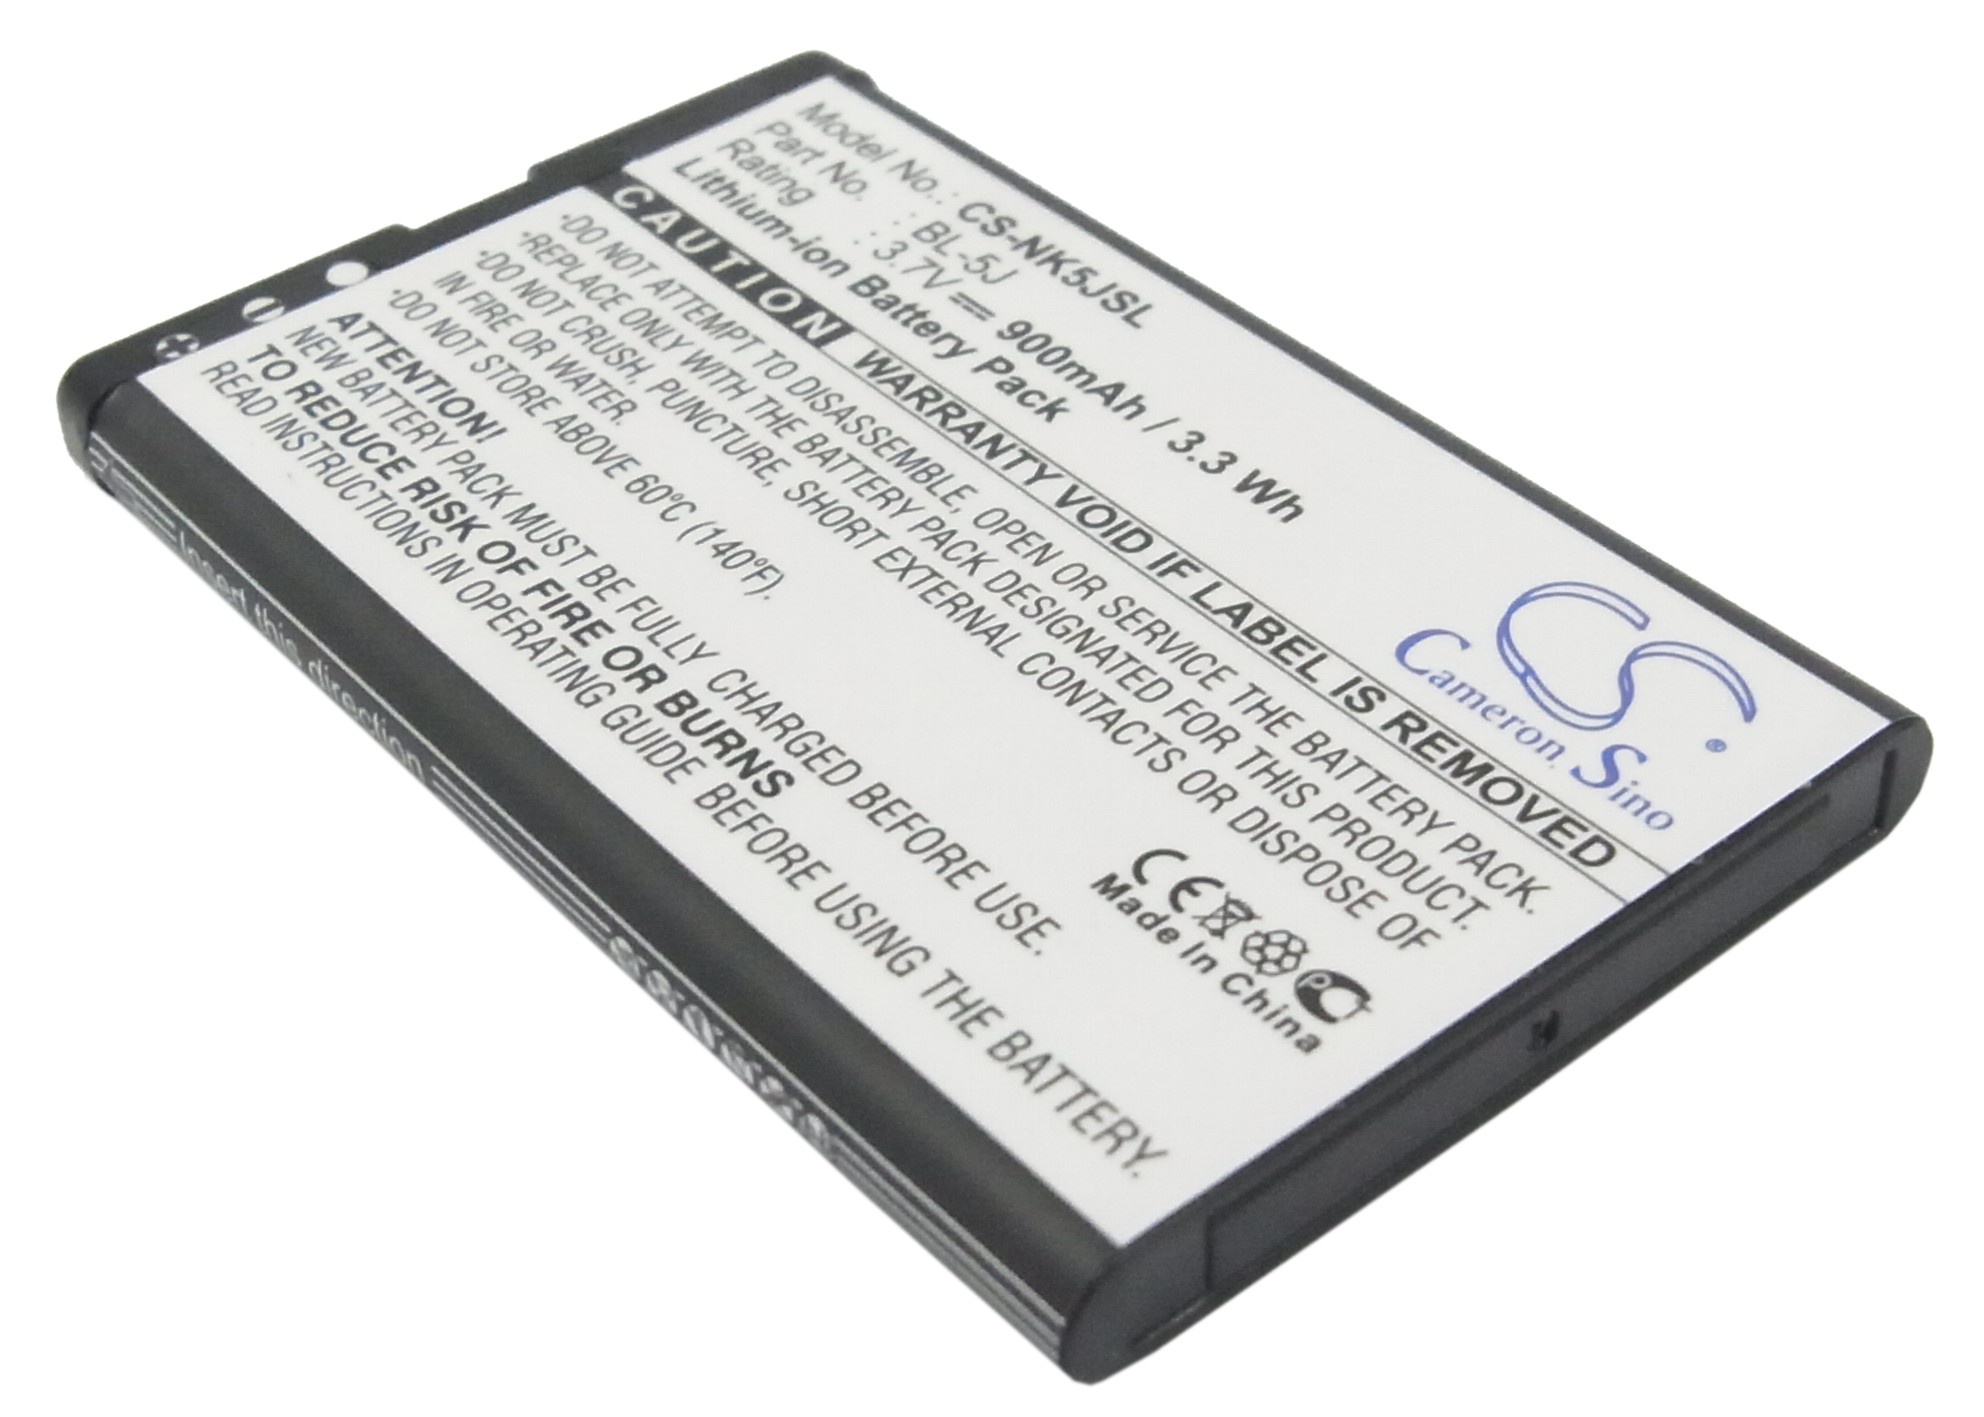 Cameron Sino baterie do mobilů pro NOKIA Asha 200 3.7V Li-ion 900mAh černá - neoriginální